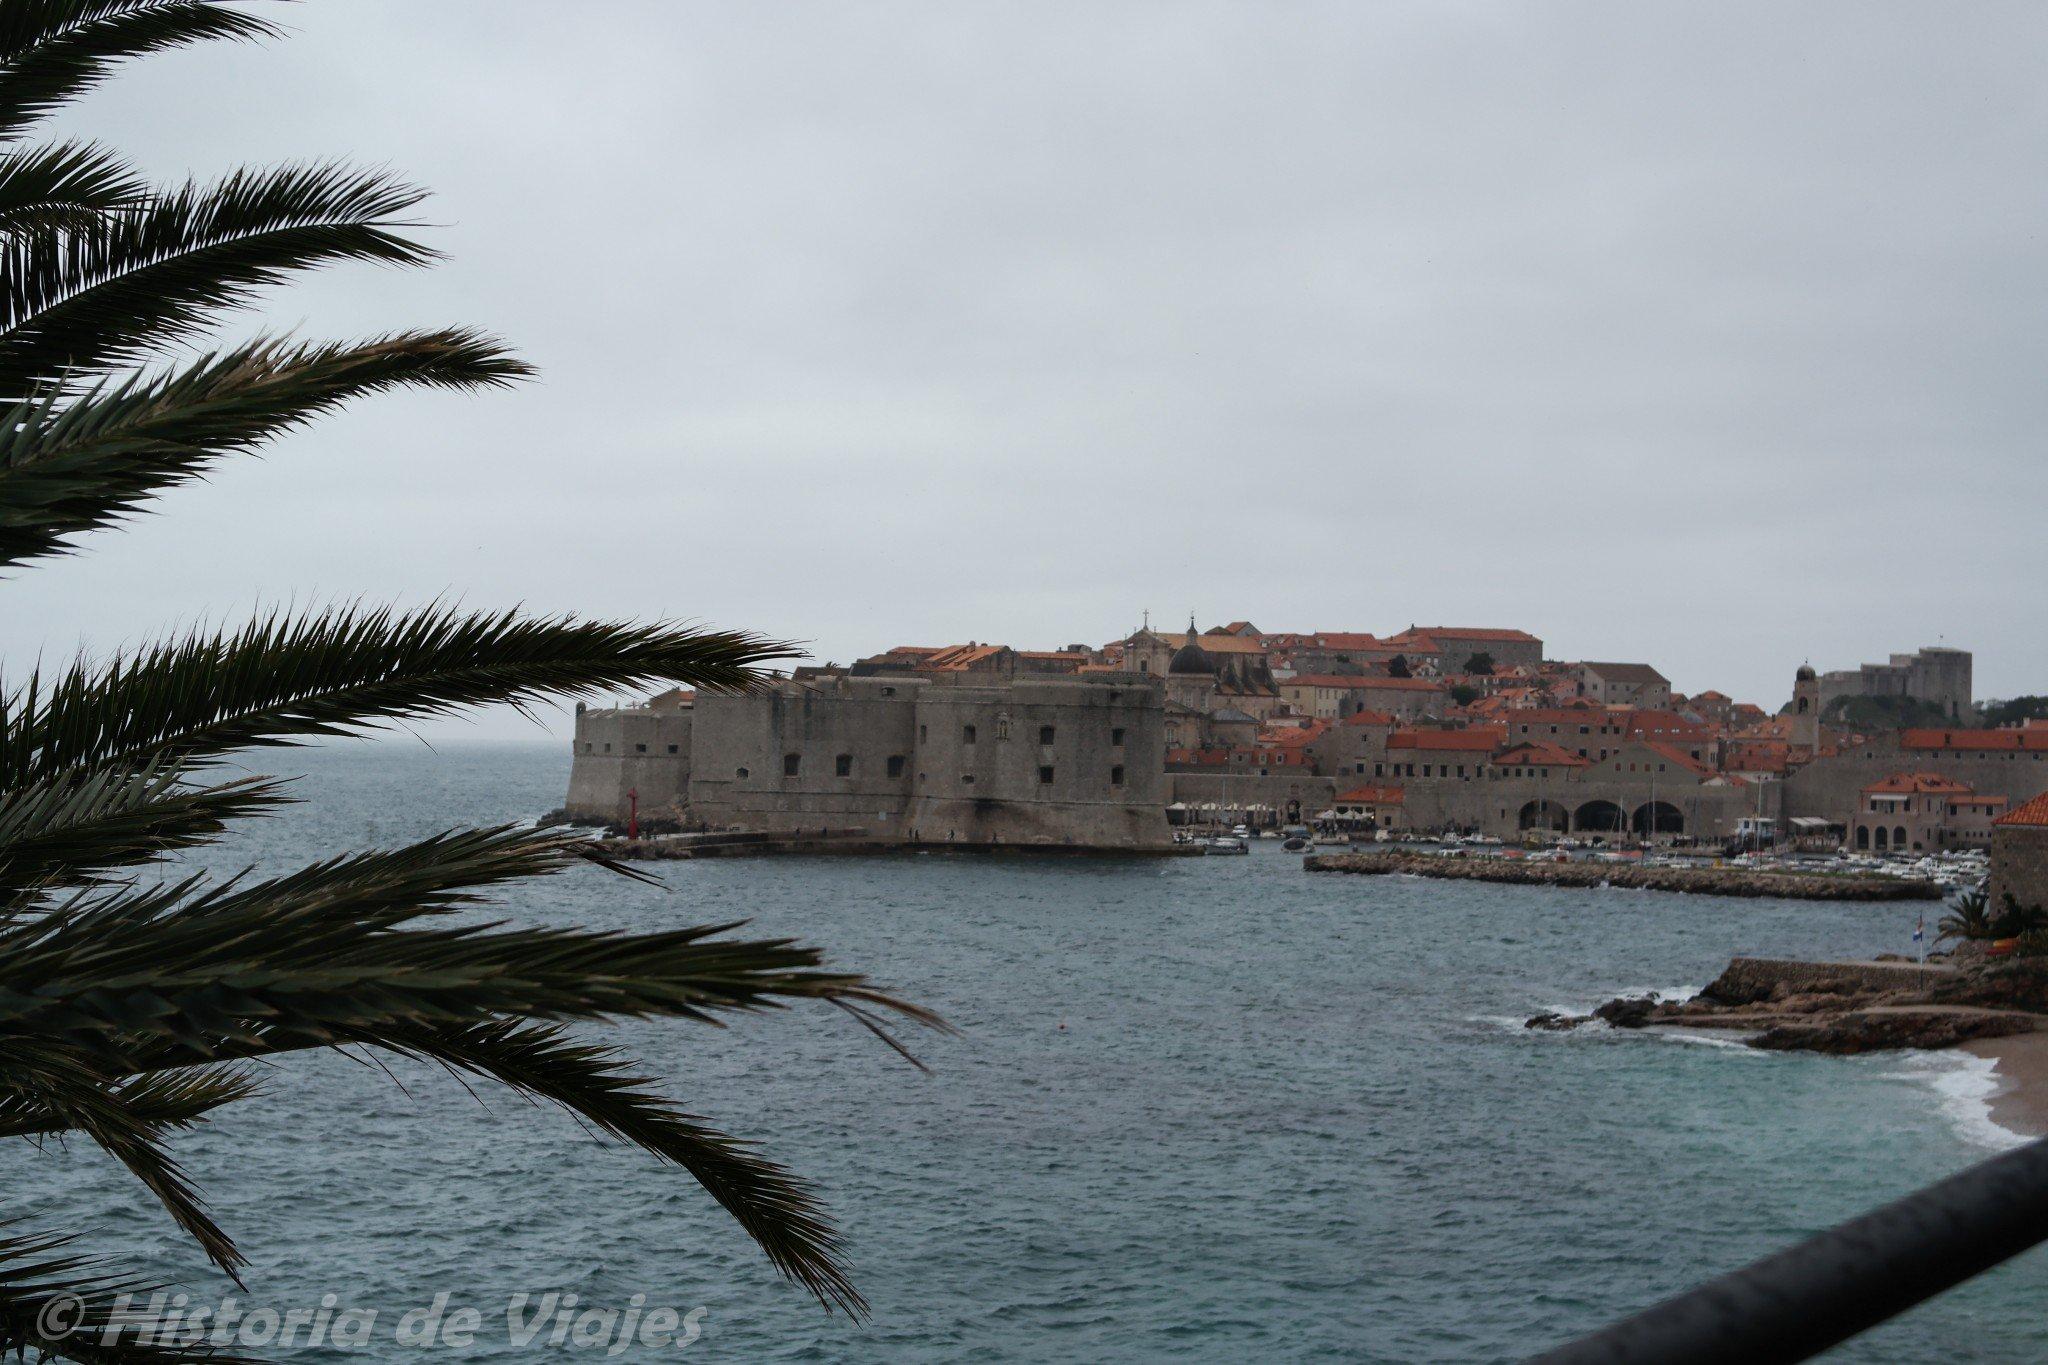 Dubrovnik_vanhakaupunki2